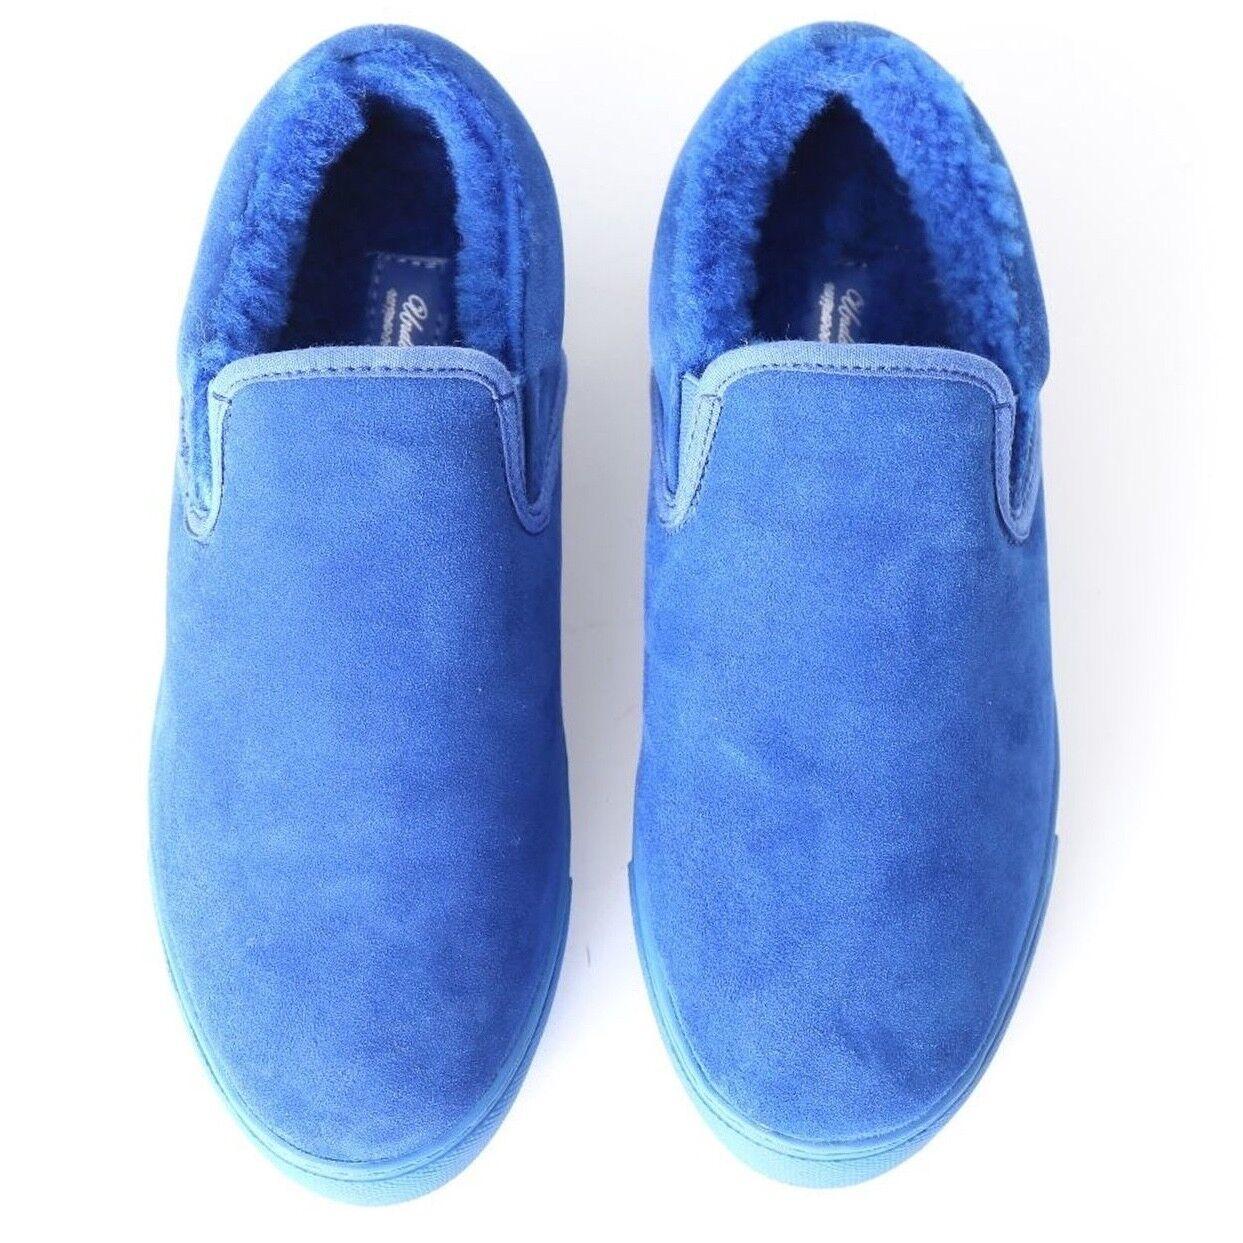 UNDERCOVER JUN TAKAHASHI blue suede shearling lined slip on sneaker Scarpe EU36